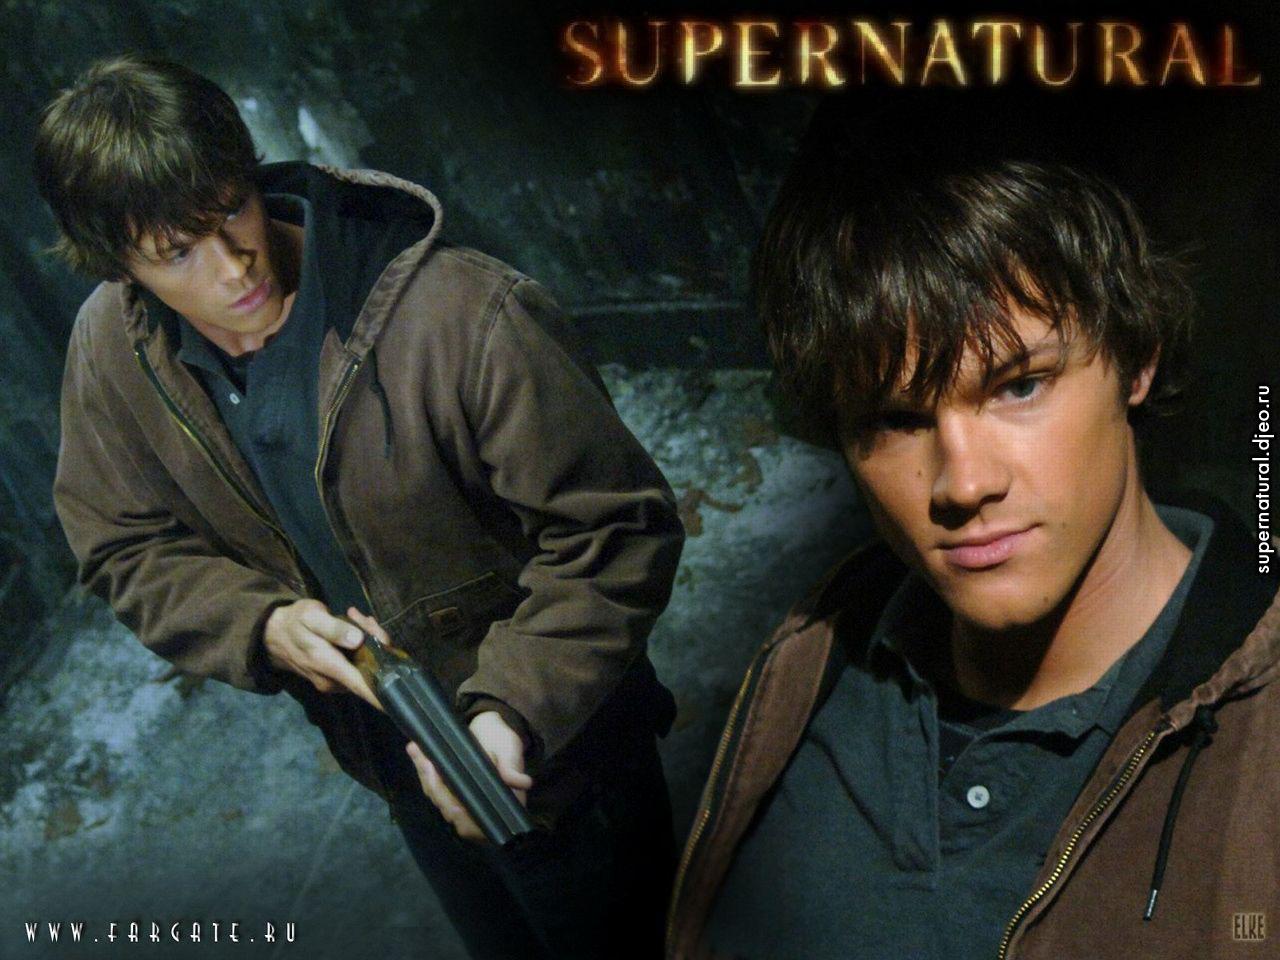 http://supernatural.djeo.ru/images_large/wallpapers/pic022.jpg